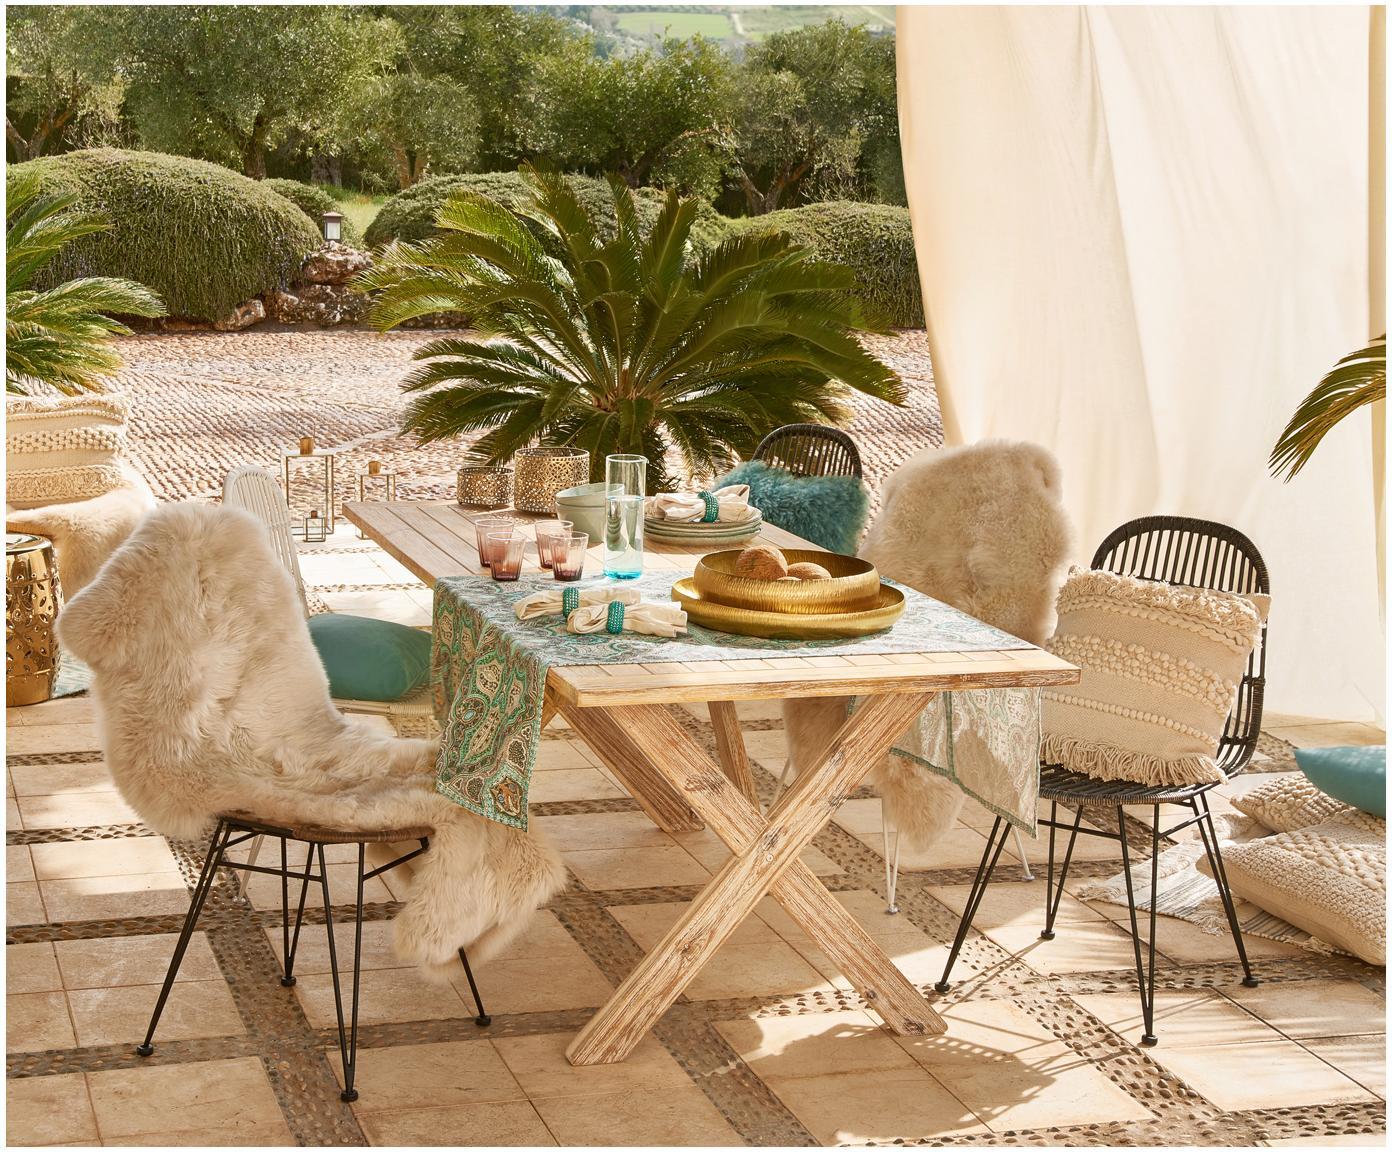 Tuintafel Arizona, Wit gewassen acaciahout, Wit gewassen acaciahout, B 200  x D 90 cm